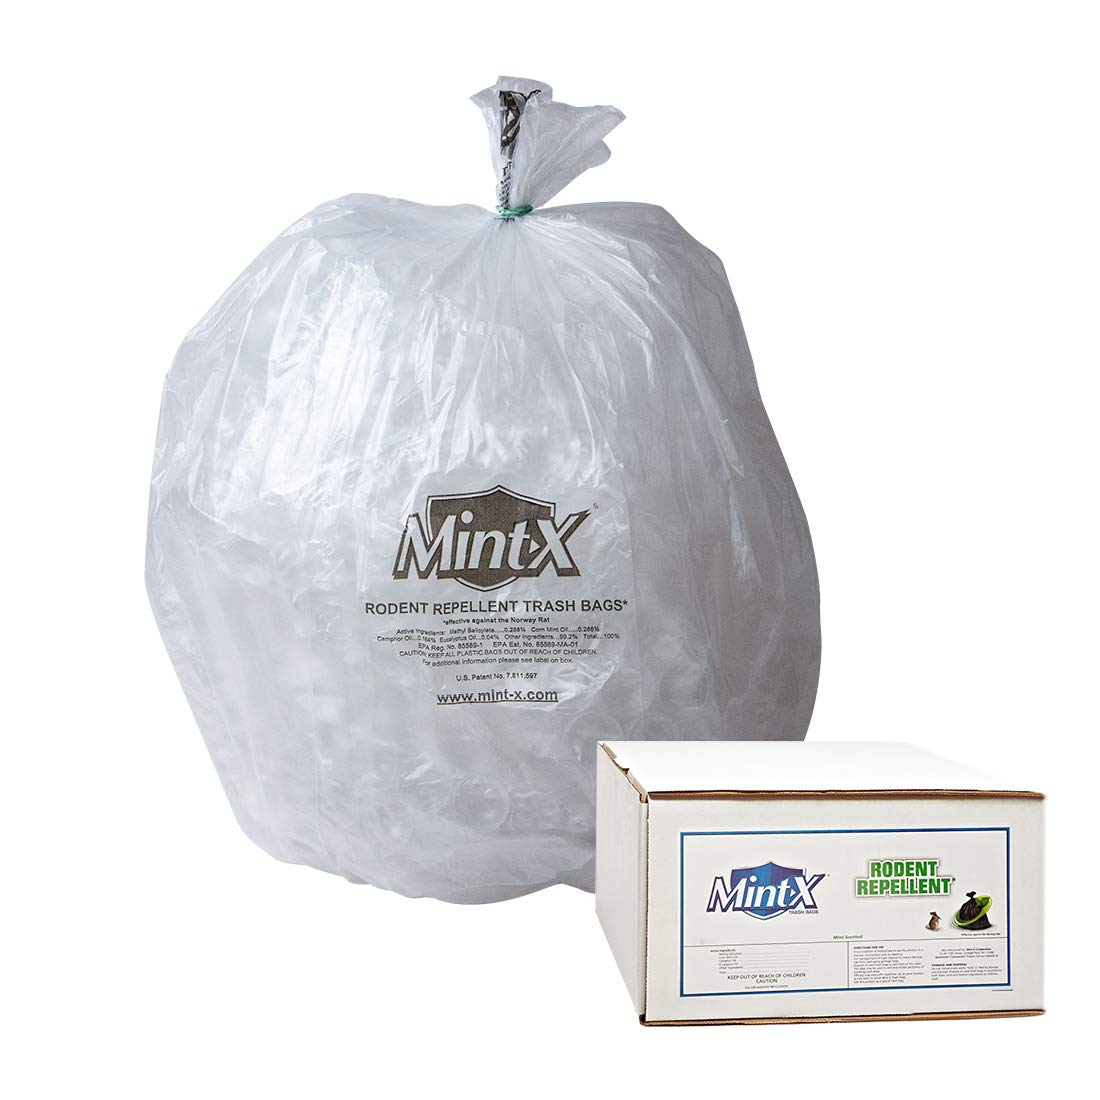 Mint-X Rodent Repellent Trash Super-cheap Bags 1.7 Flat Ranking TOP3 Mil Hei 58